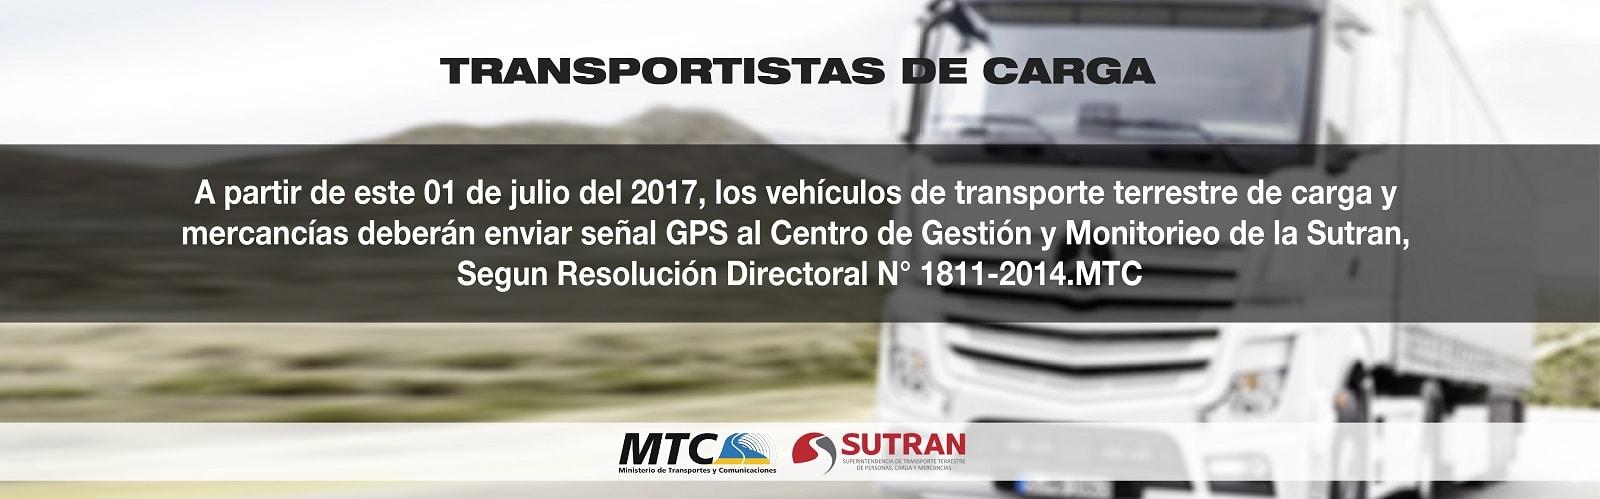 gps-transporte-carga-sutran-2